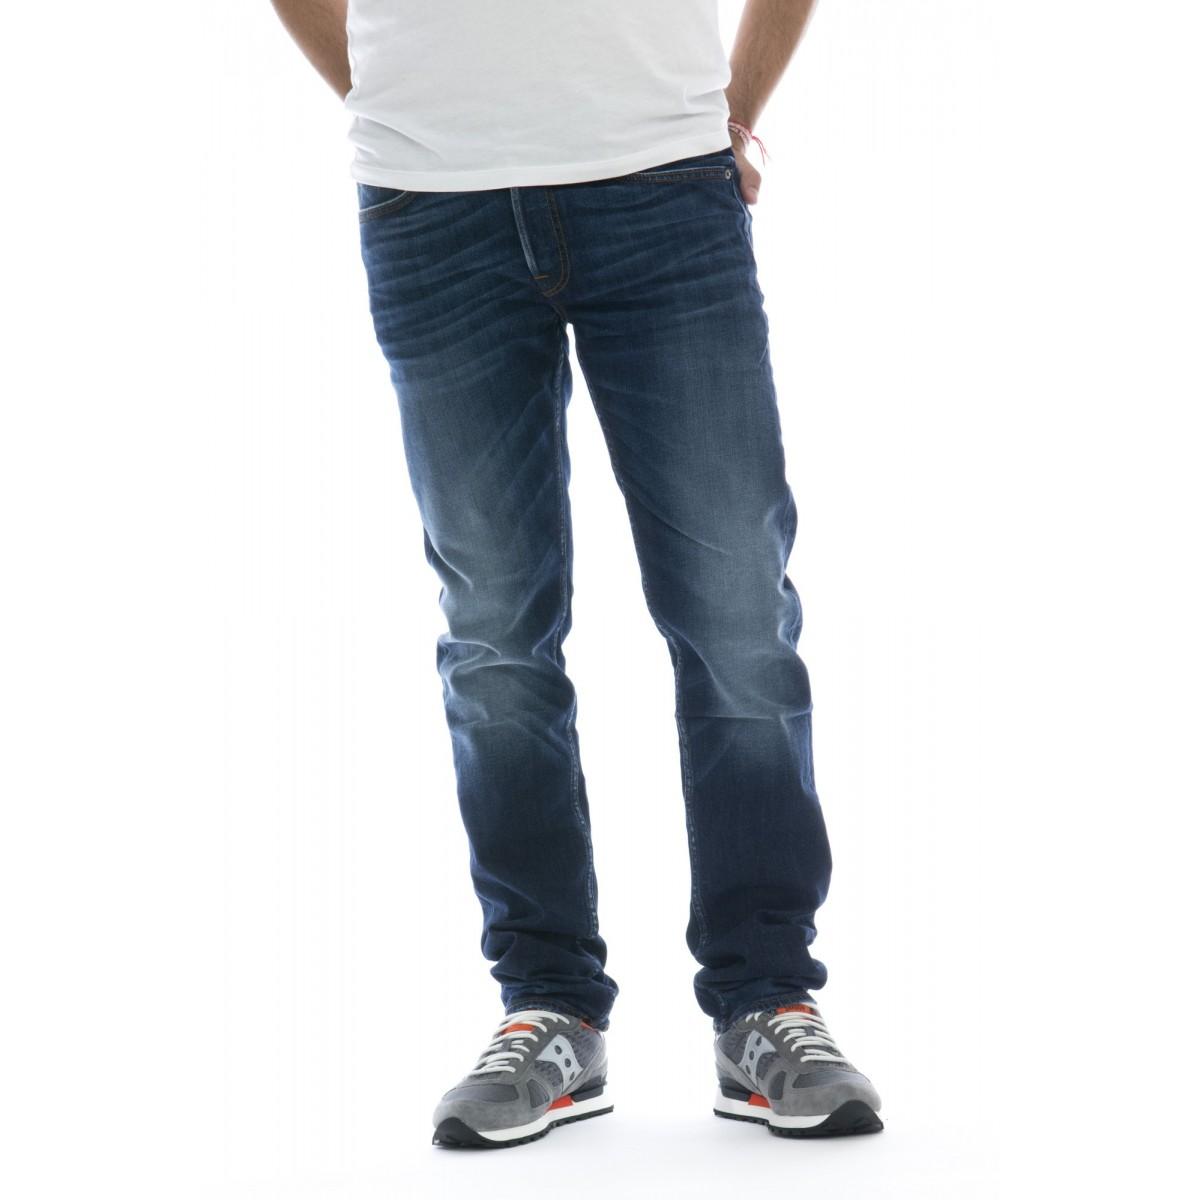 Jeans - J1bga jeans slim real 98% cotone, 2% elastane